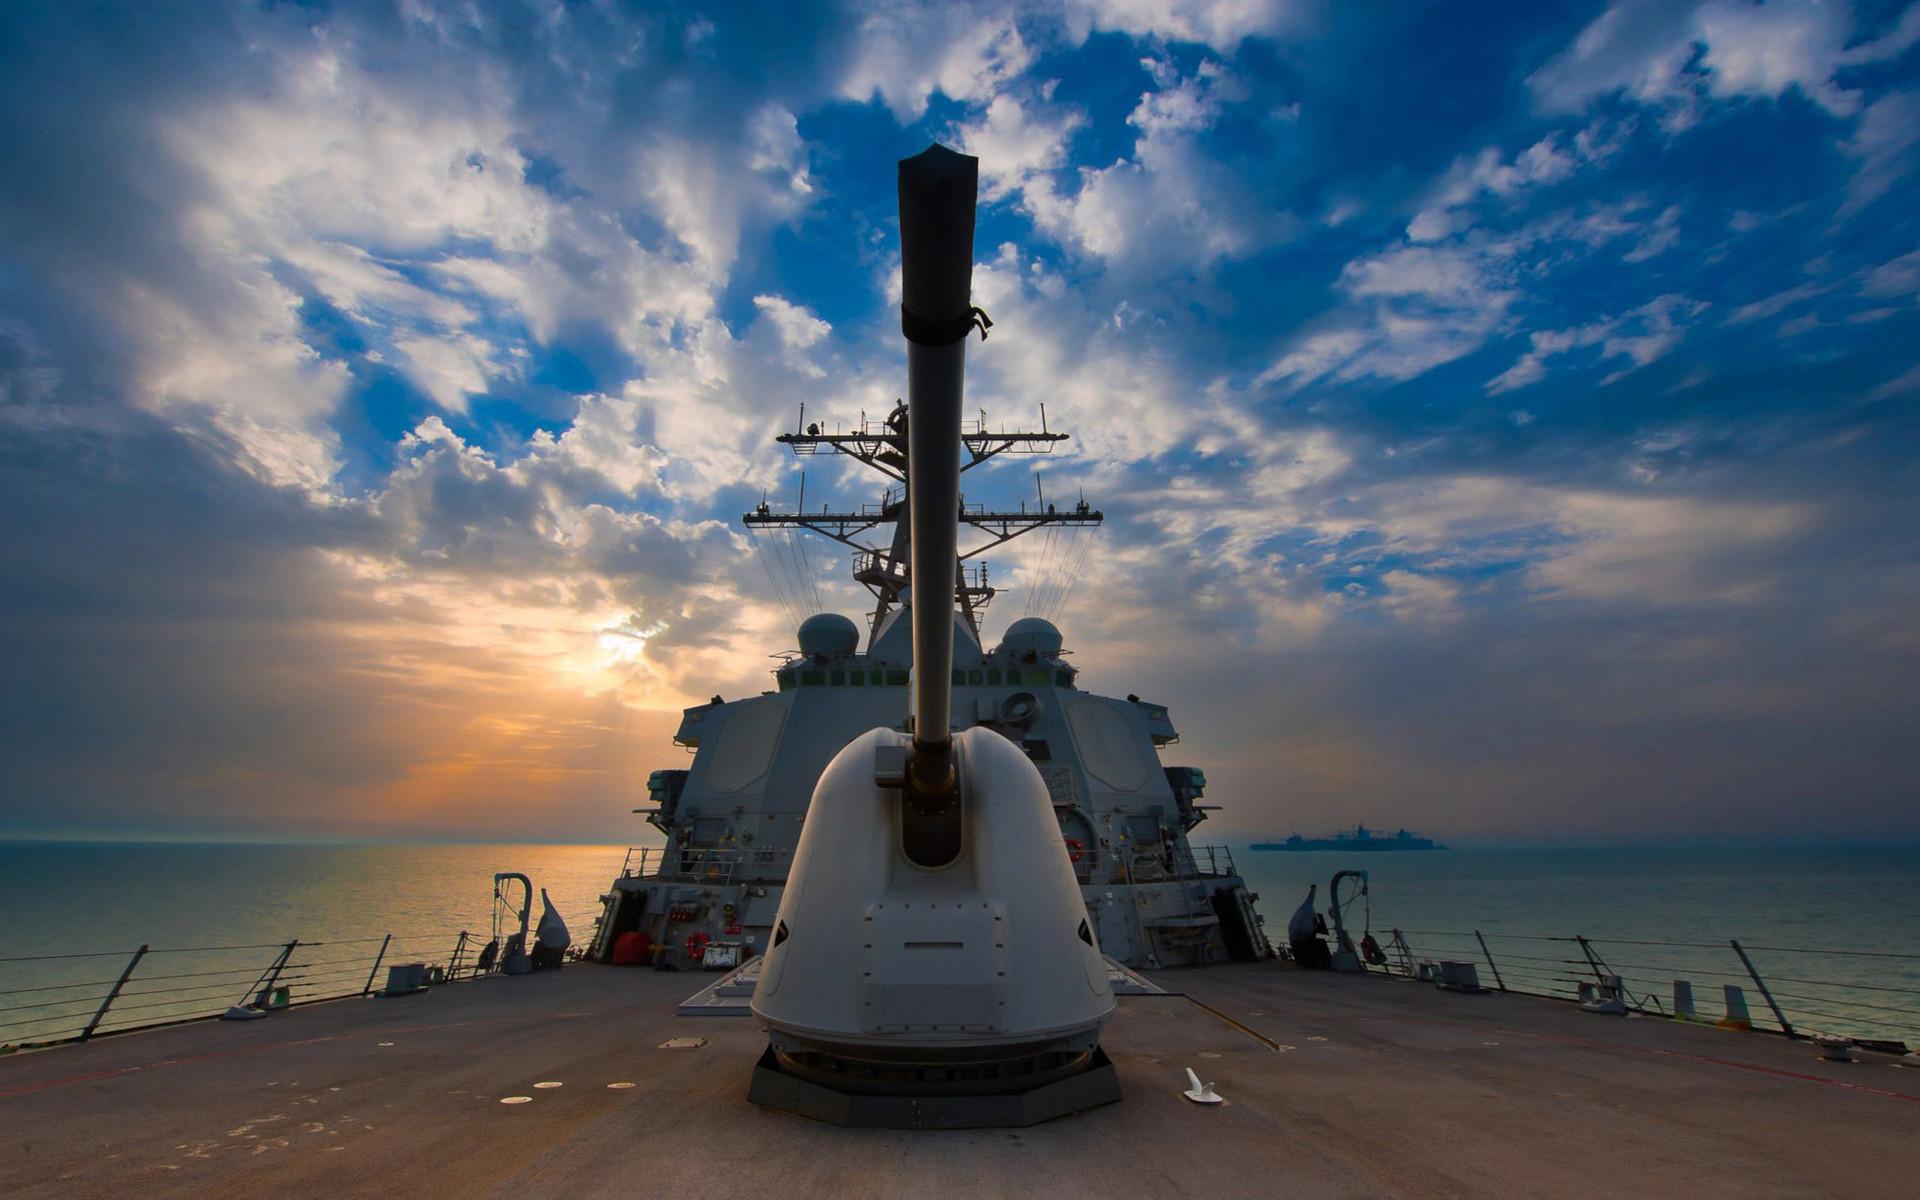 wallpaper of us navy destroyer free computer desktop wallpaper images .